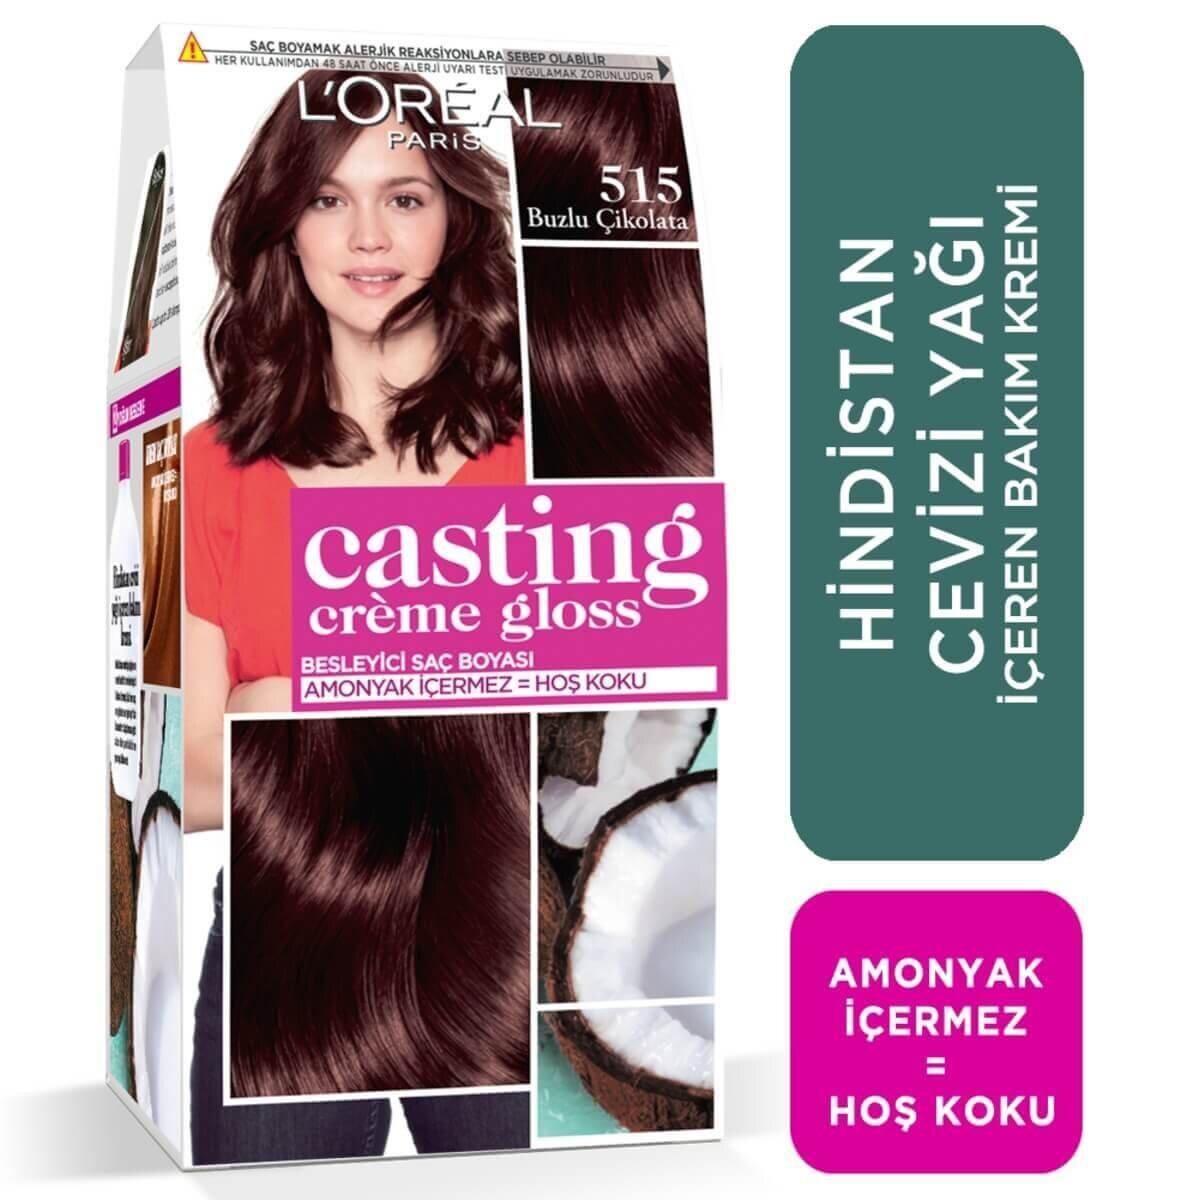 Creme Gloss Saç Boyası Buzlu Çikolata No. 515